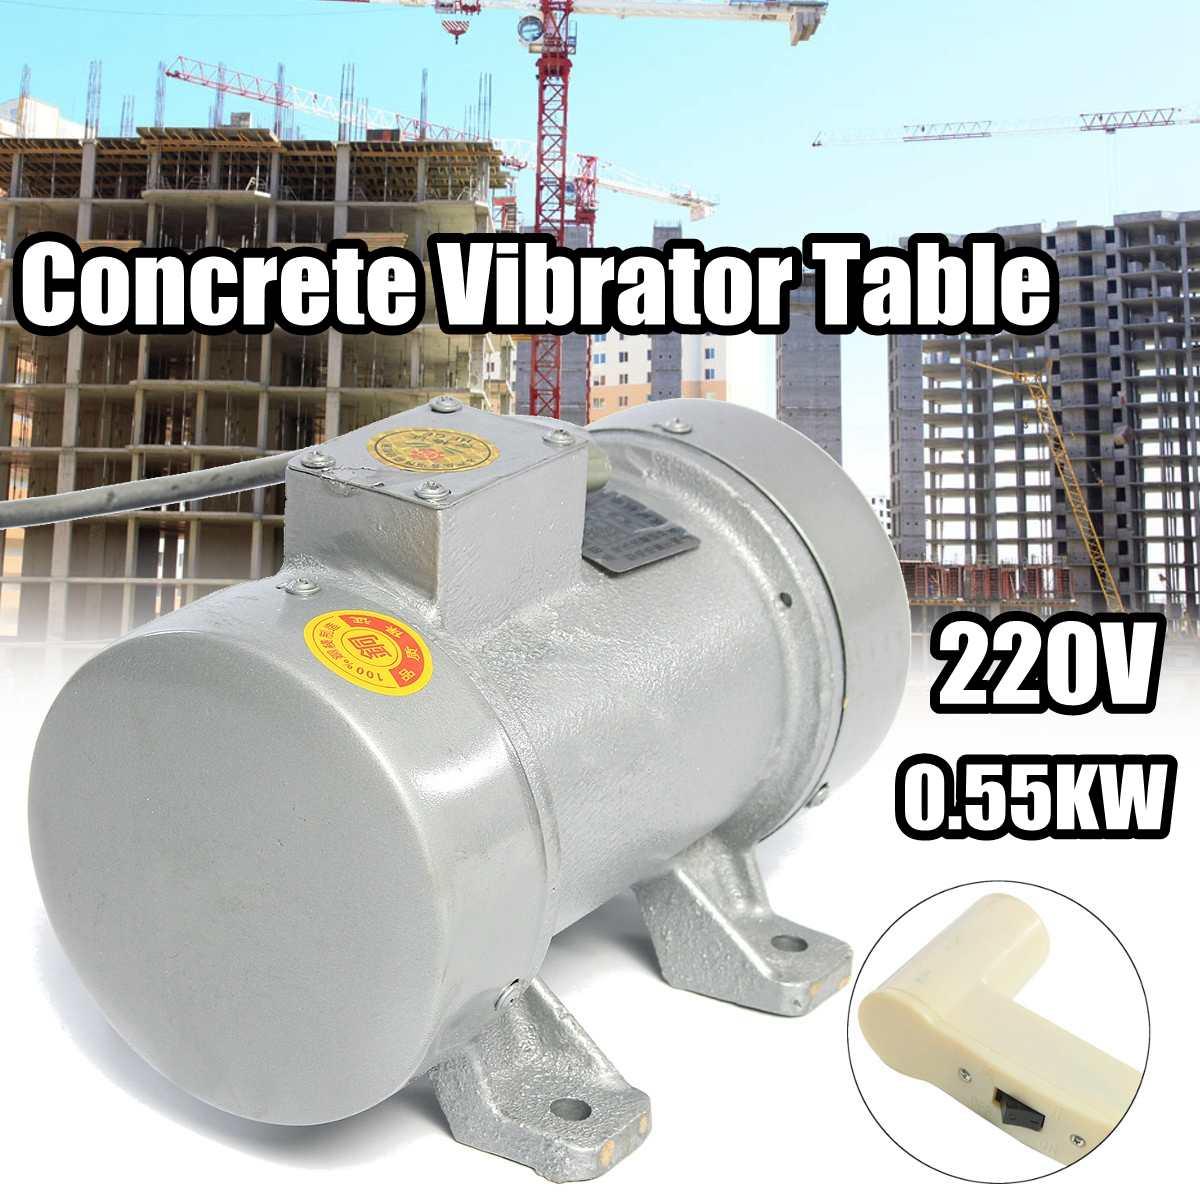 Doersupp  220V 550W Concrete Vibrator Motor Single phase copper core For Concrete Vibrator Table ToolsDoersupp  220V 550W Concrete Vibrator Motor Single phase copper core For Concrete Vibrator Table Tools